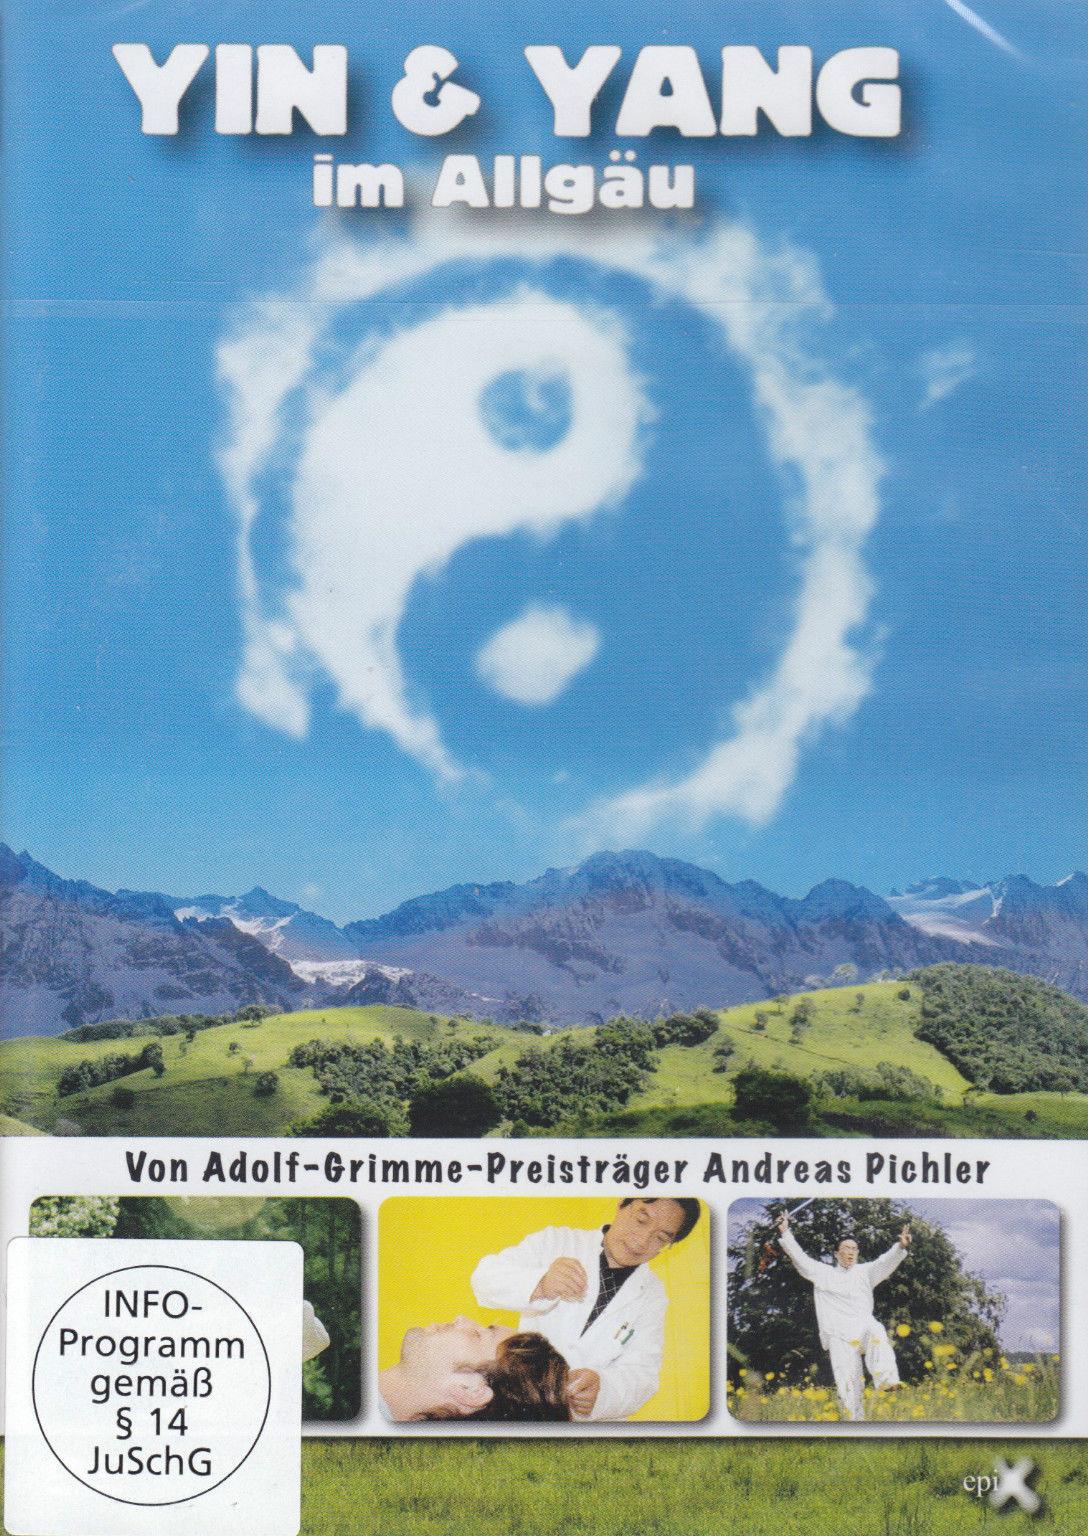 Yin und Yang DVD Cover